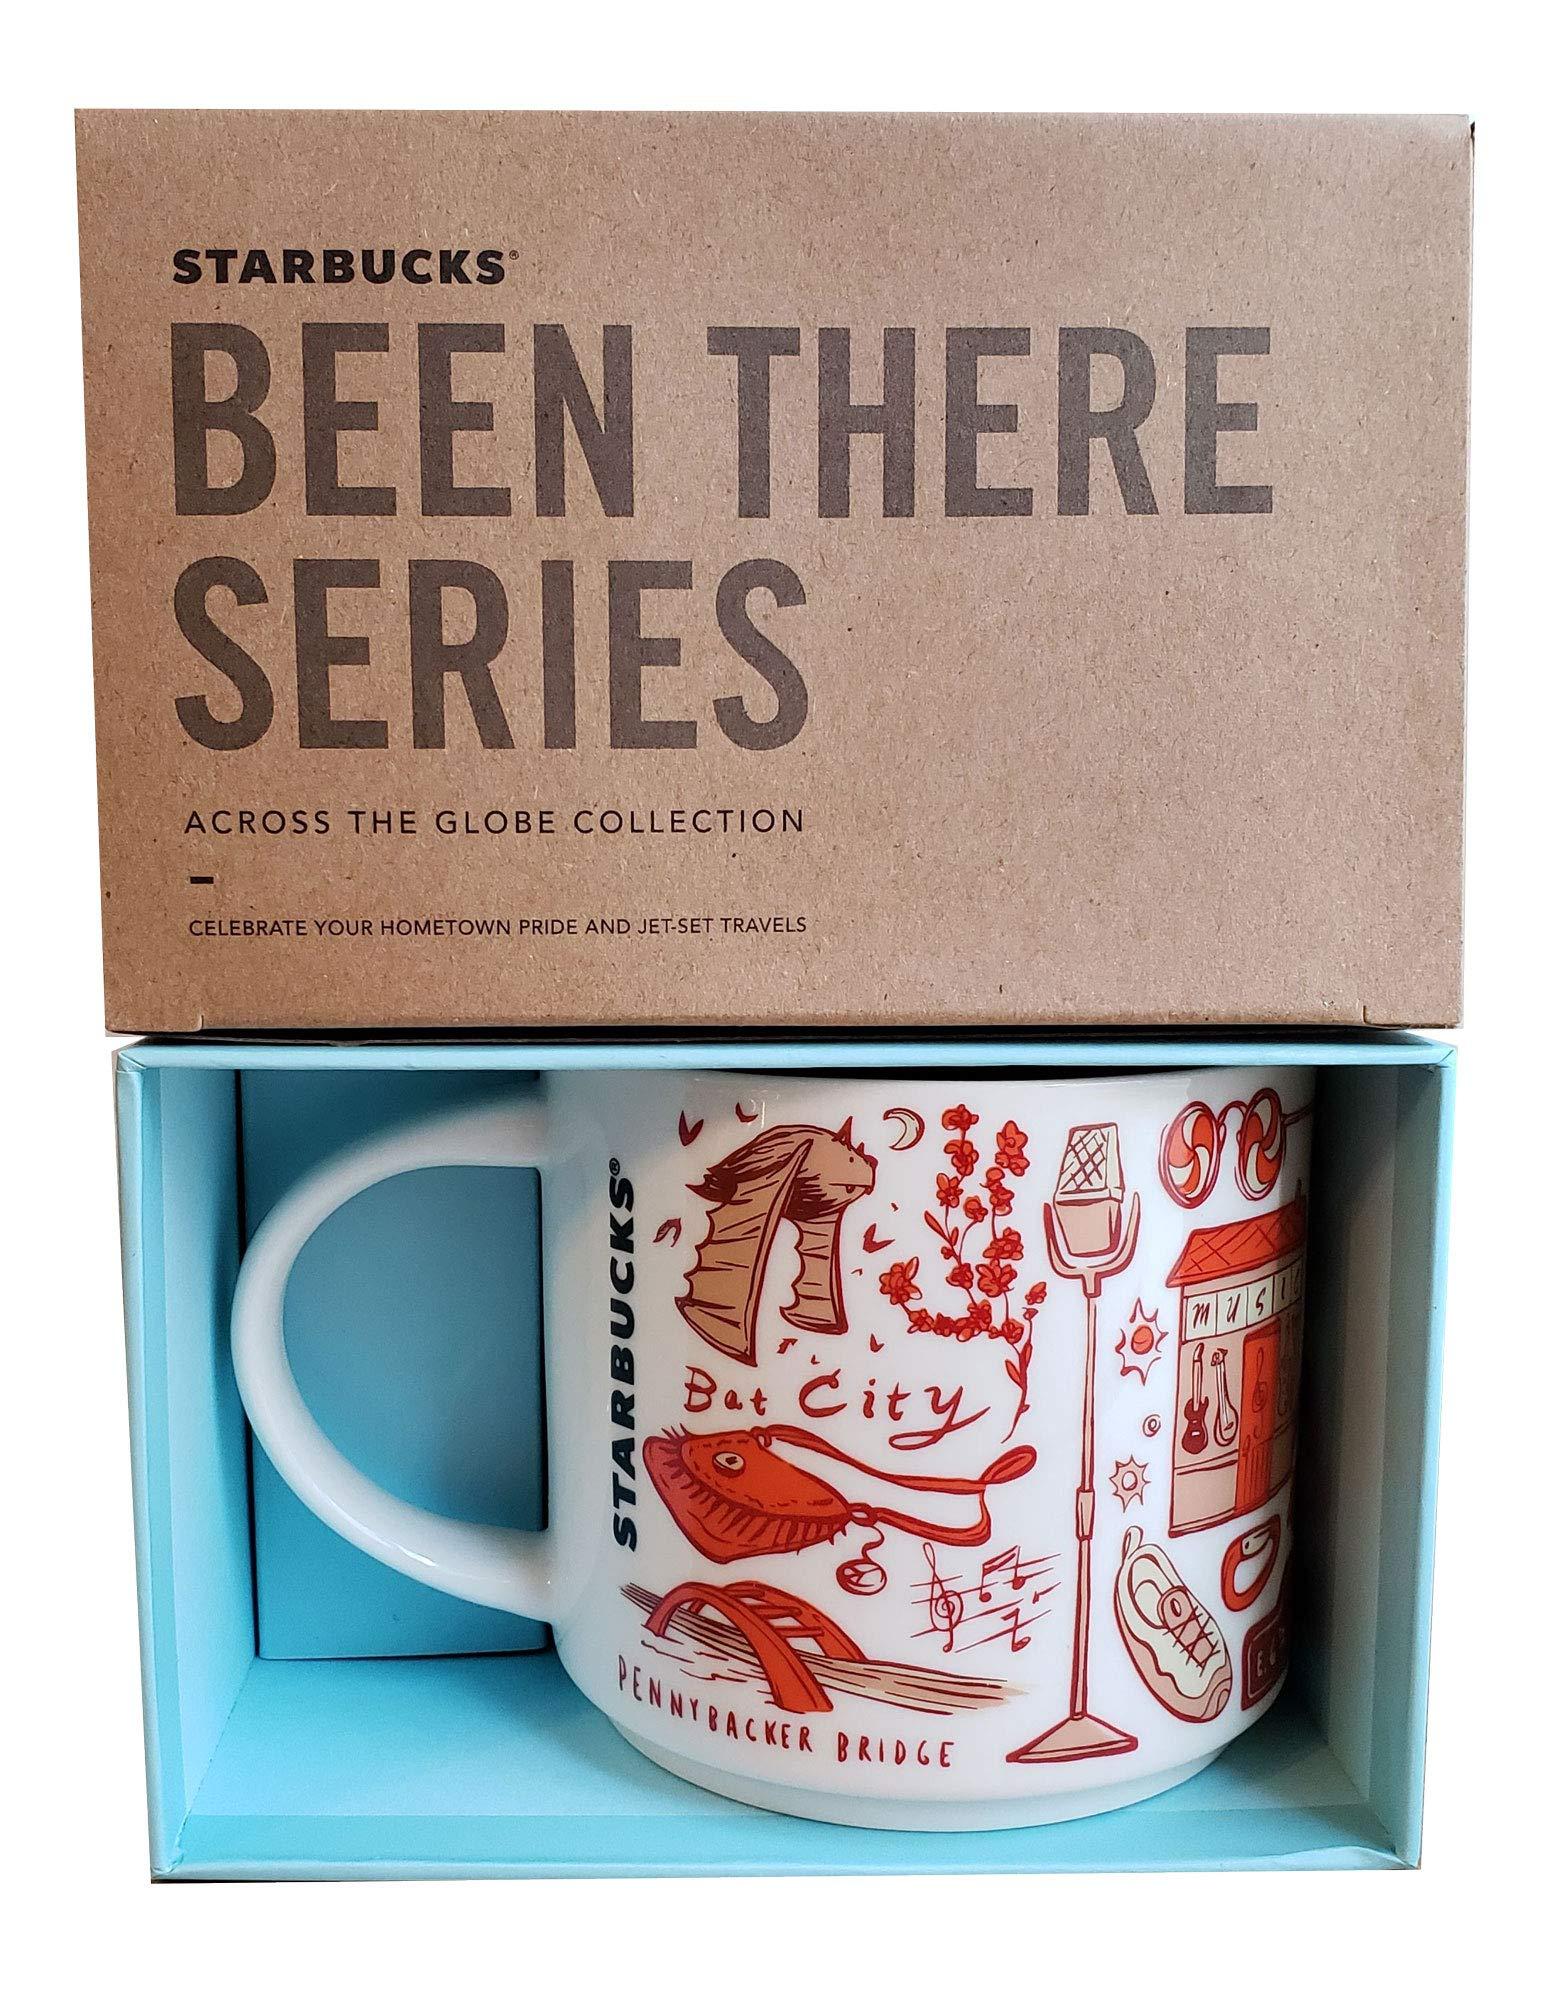 Starbucks Austin Coffee Mug - Been There Series by Starbucks (Image #2)